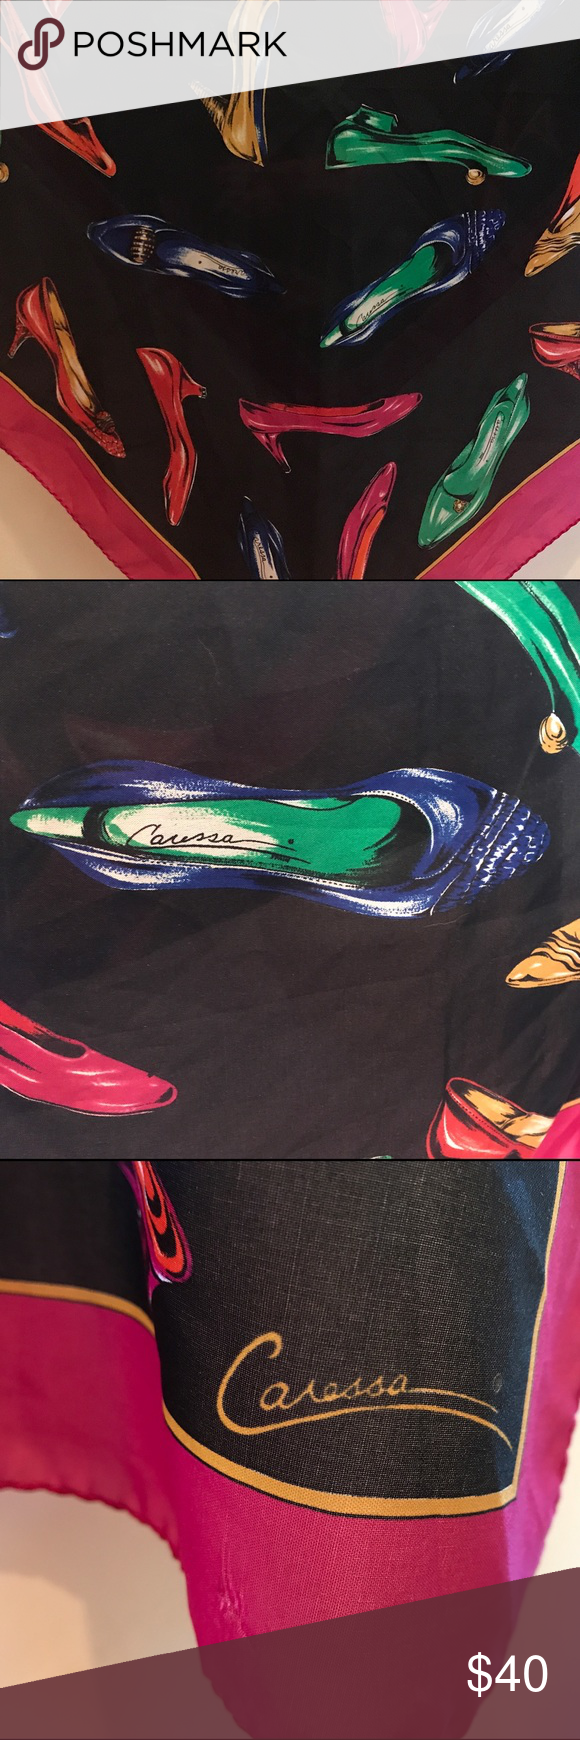 "Caressa Silk Scarf 👠 Vintage 1970's Caressa Silk Scarf! 👠Chic Shoe👠Design! 30"" x 30"" unique and classic!!!👠👠👠 Caressa Accessories Scarves & Wraps"